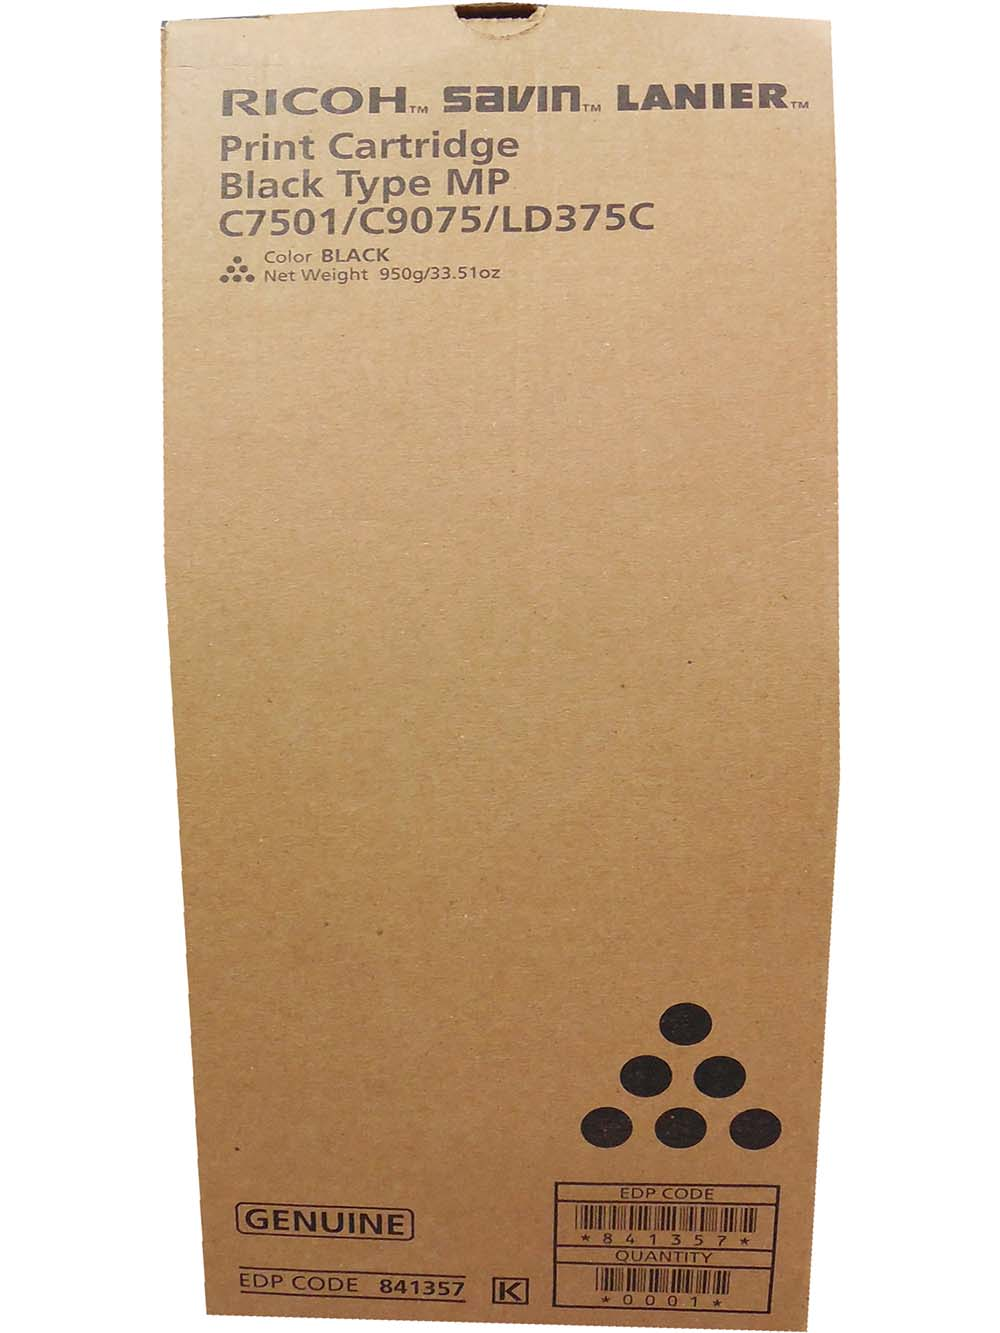 Toner Ricoh MPC 6501/ Ricoh MPC 7501 - Black - Original (841357)